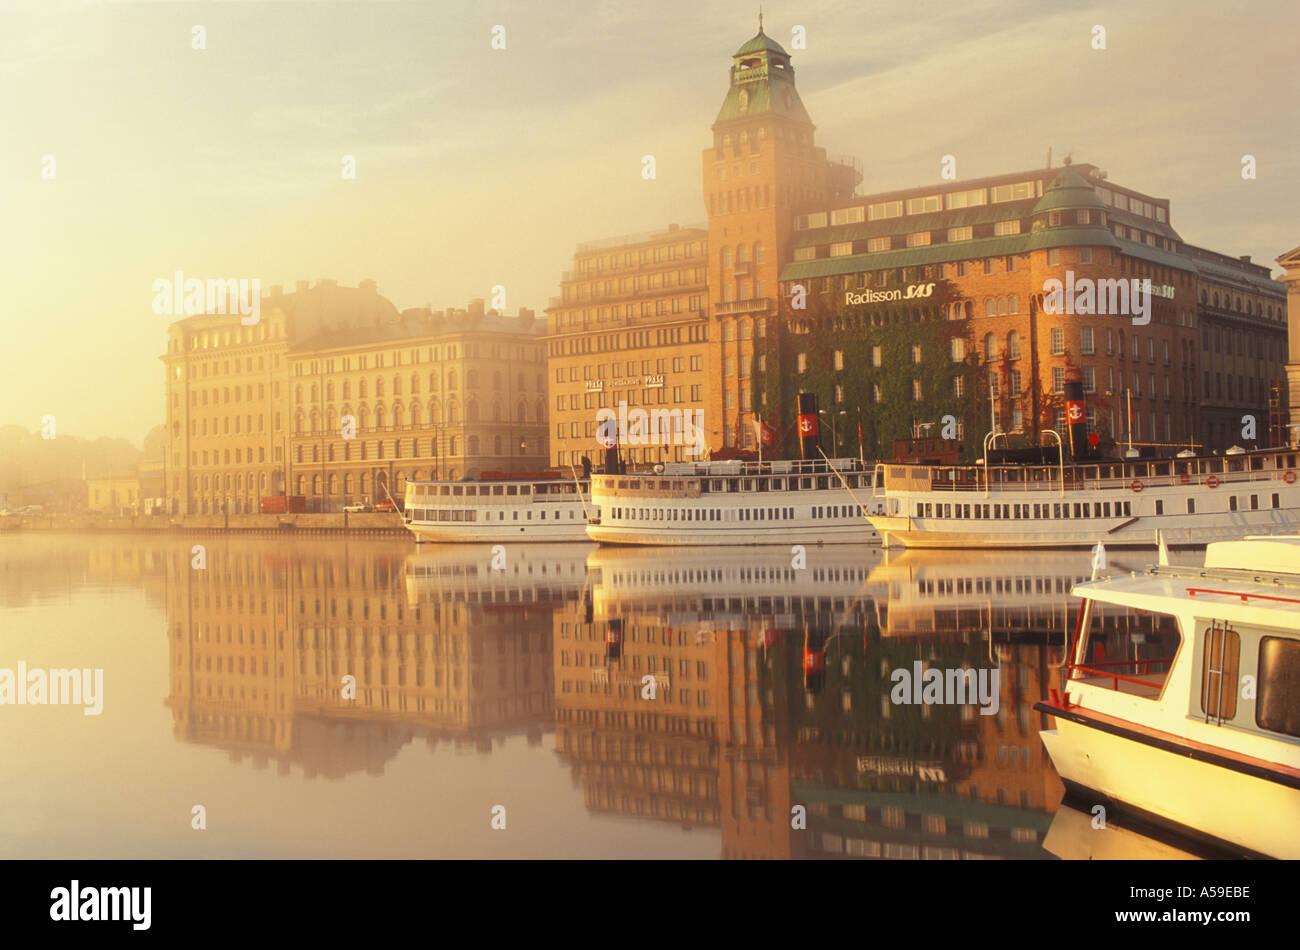 Ferryboats anchored at Nybroviken with SAS Radisson Hotel at sunrise in Stockholm - Stock Image